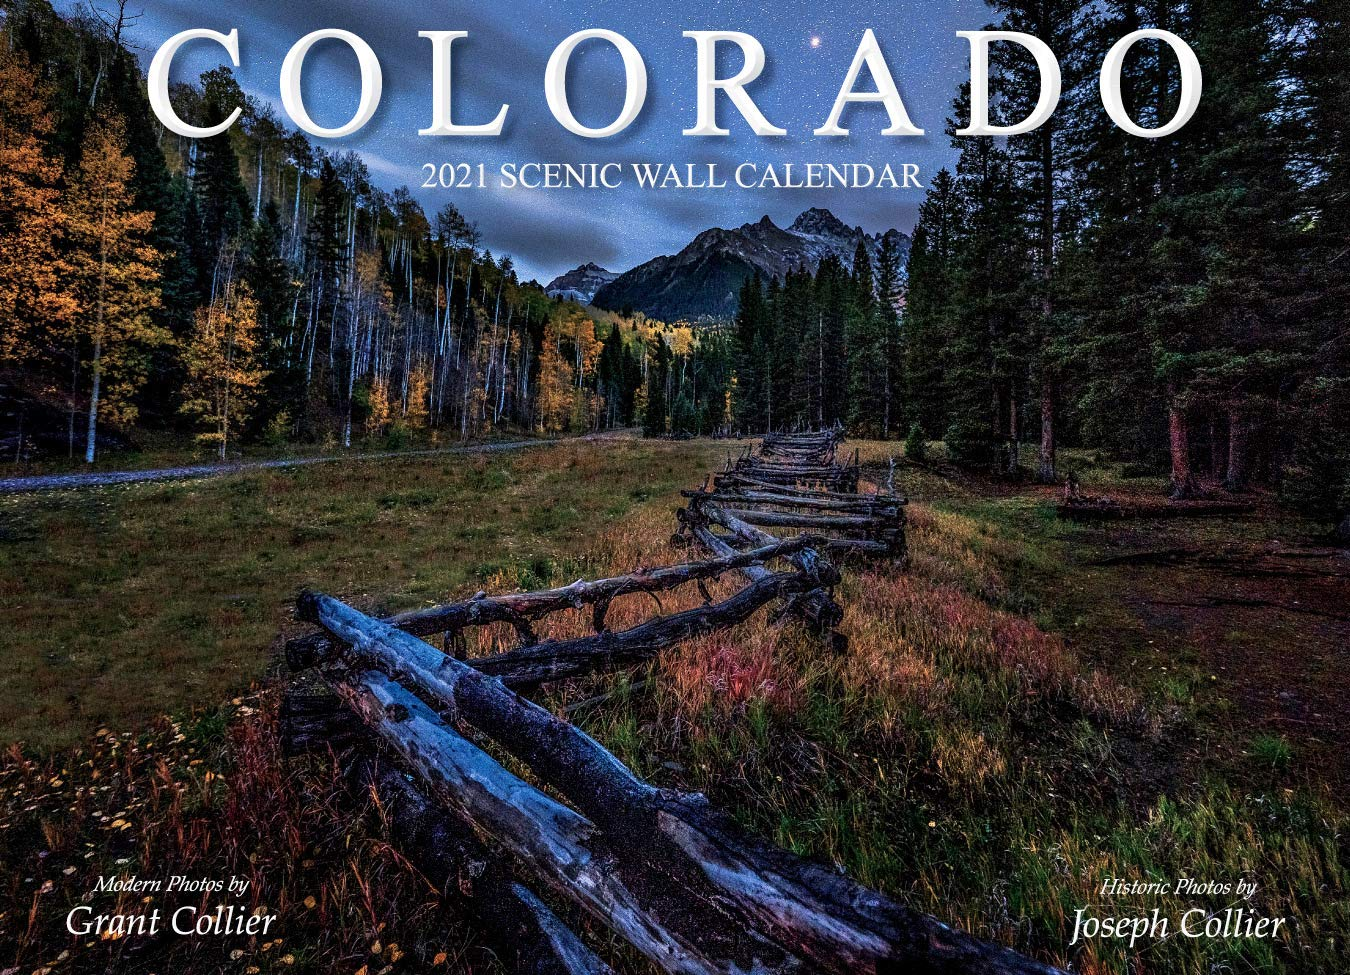 Image for Colorado 2021 Scenic Wall Calendar